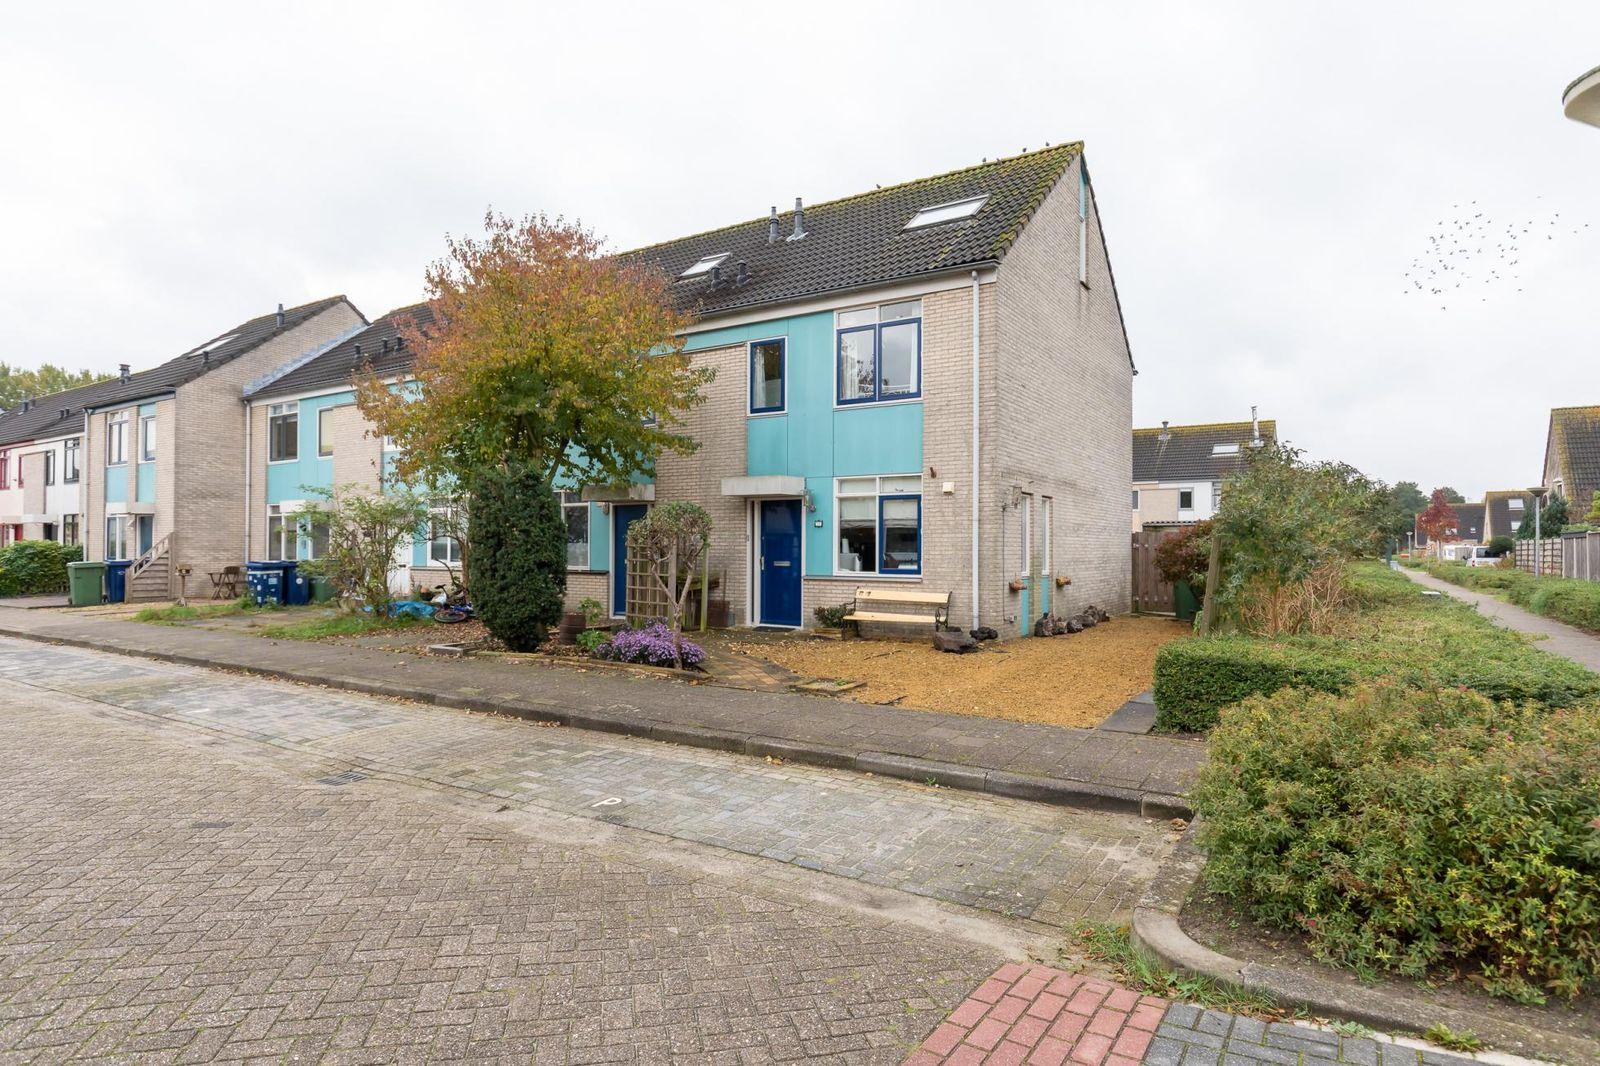 D. Hudigstraat 29, Almere